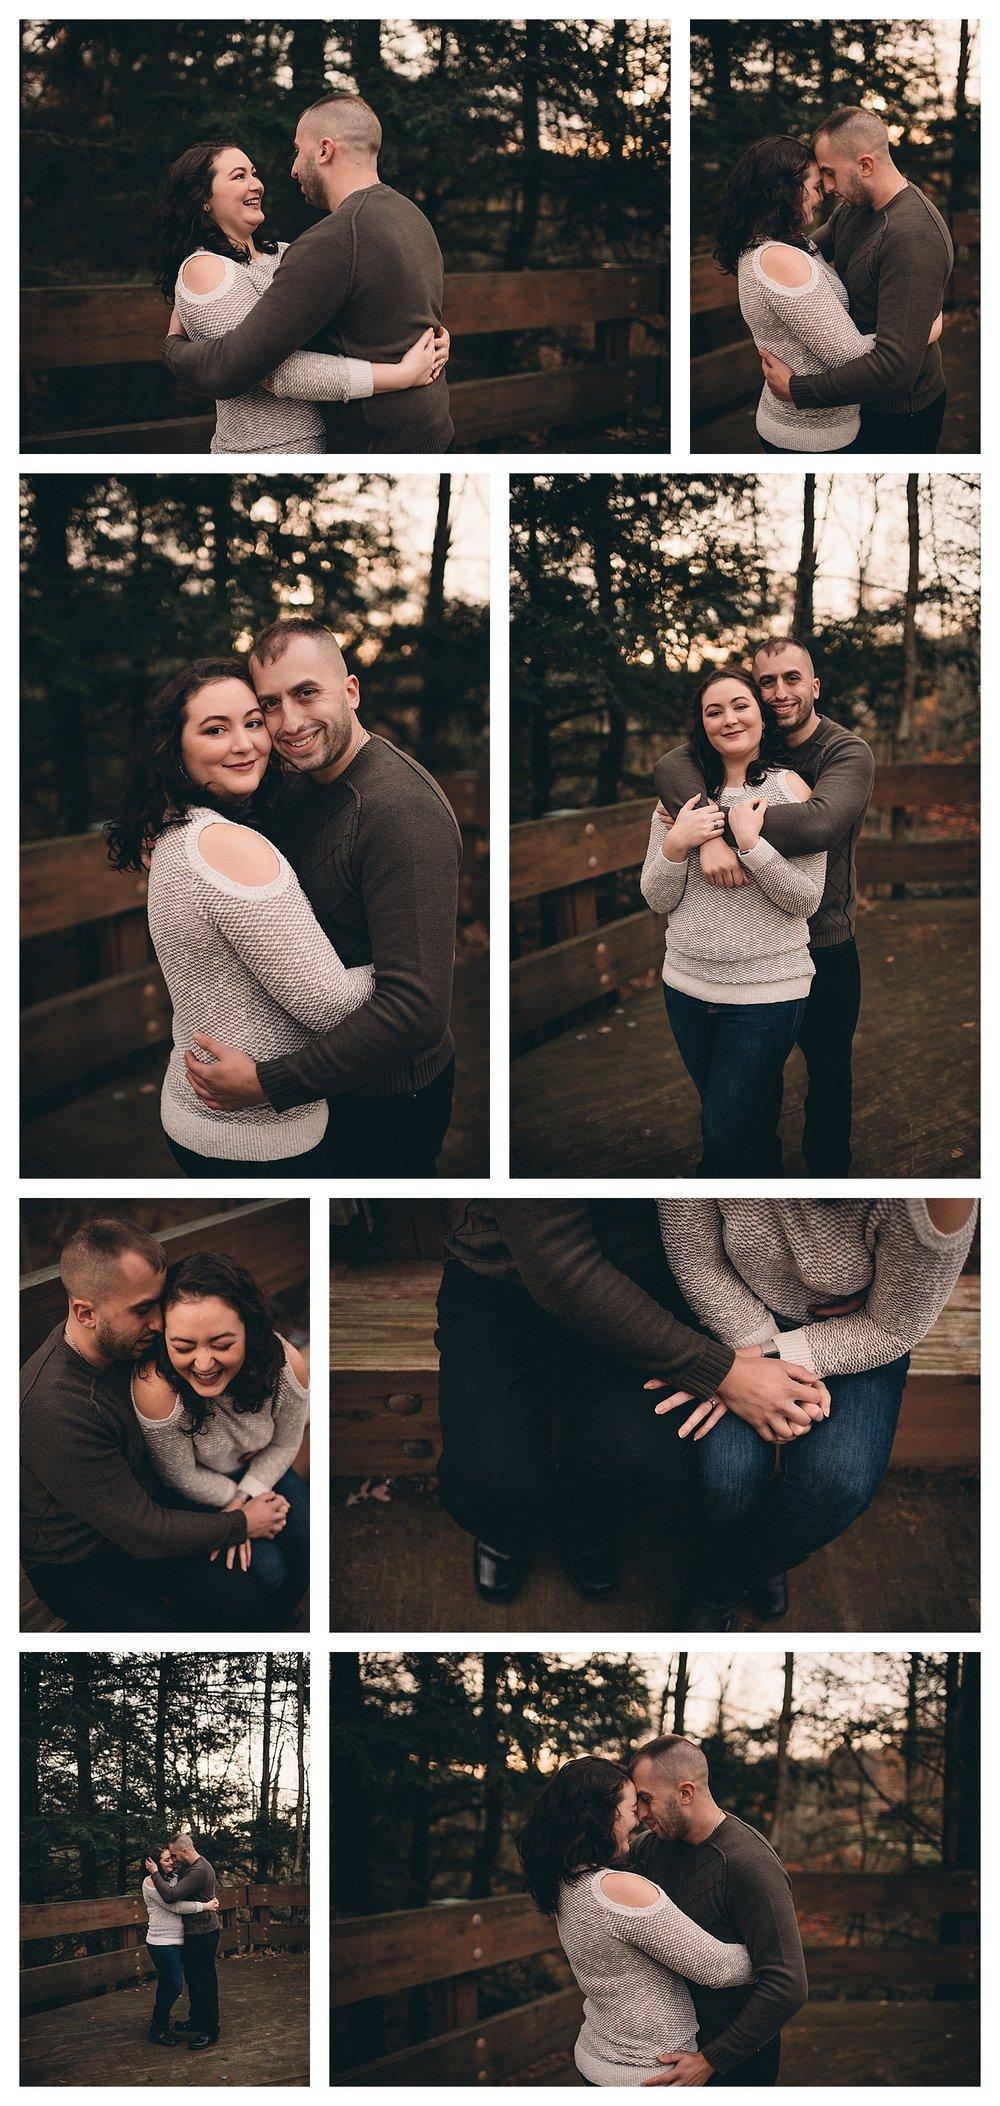 NEPA-Scranton-wedding-engagement-photographer-in-Philadelphia-PA-Central-PA_0312.jpg